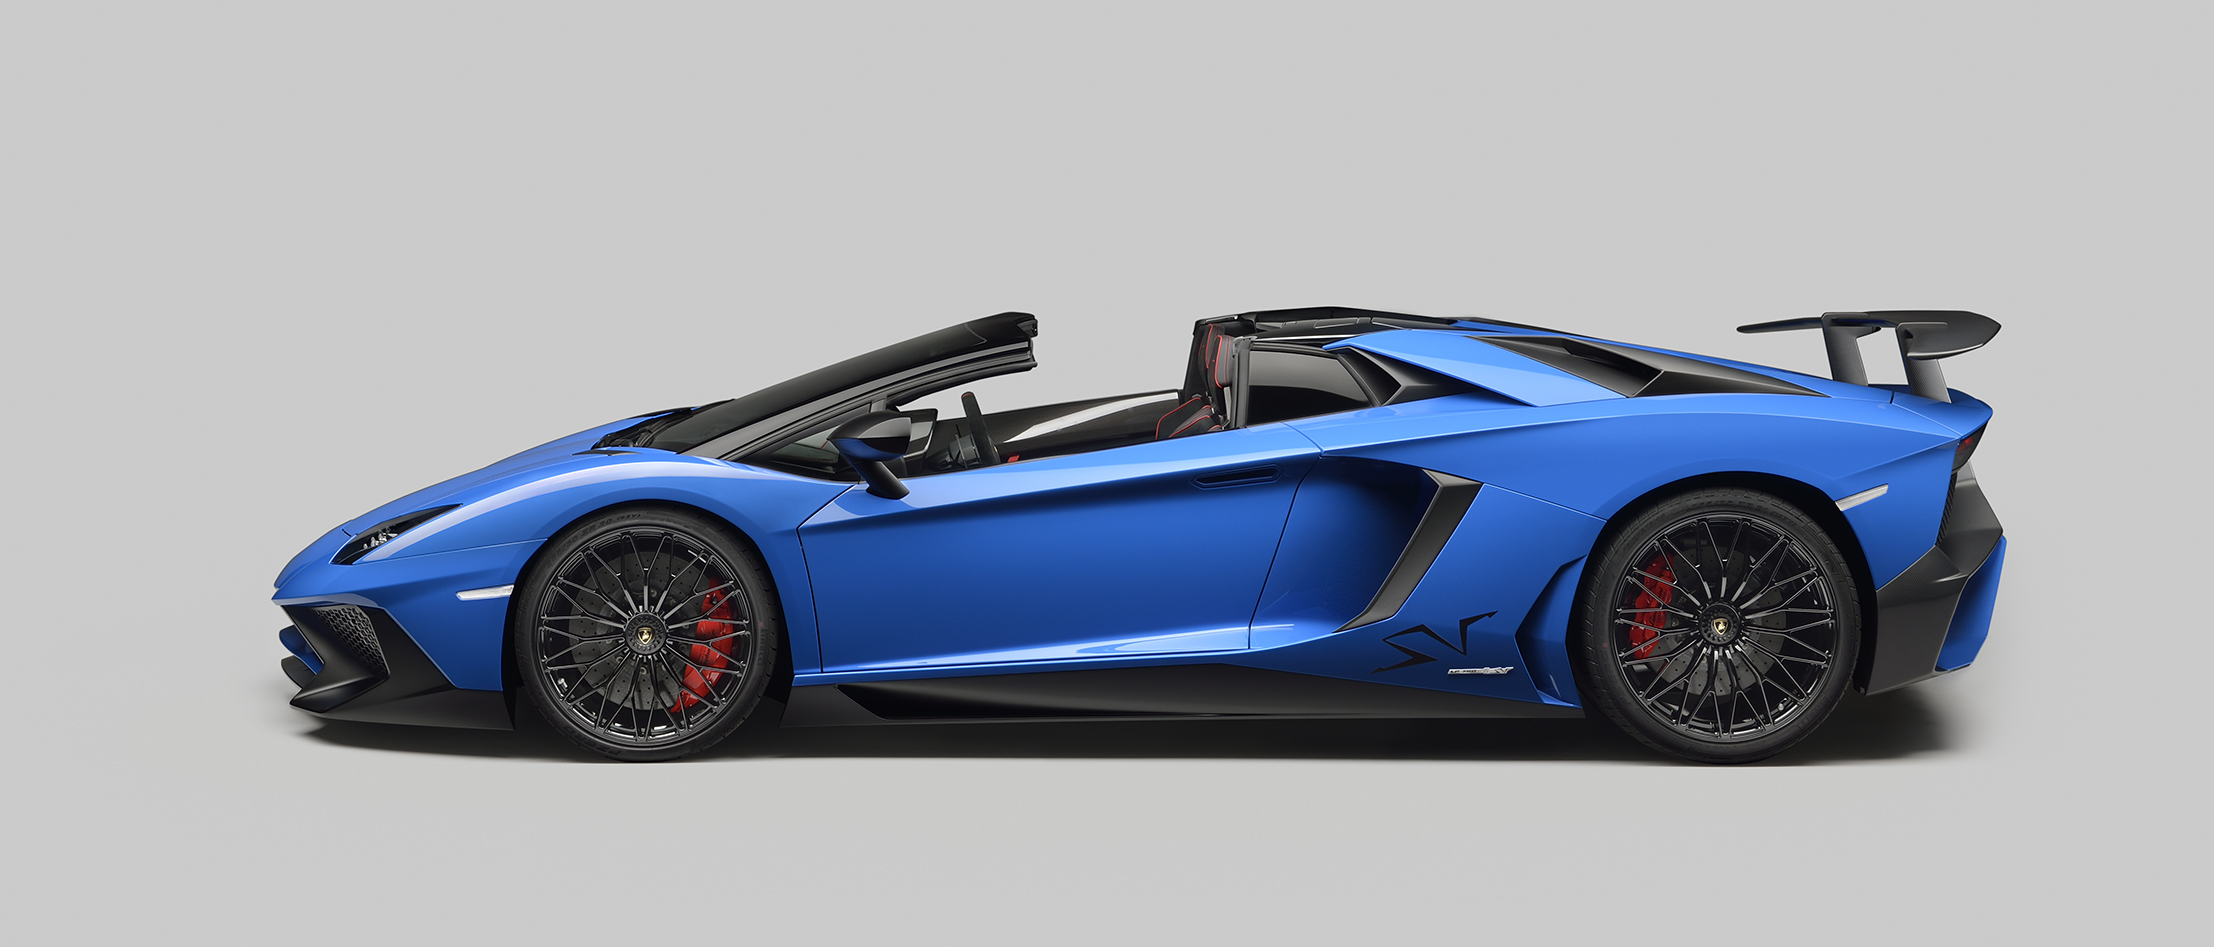 Automobili Lamborghini Unveils The New Lamborghini Aventador LP 750 4  Superveloce Roadster In Occasion Of The Monterey Car Week In California.